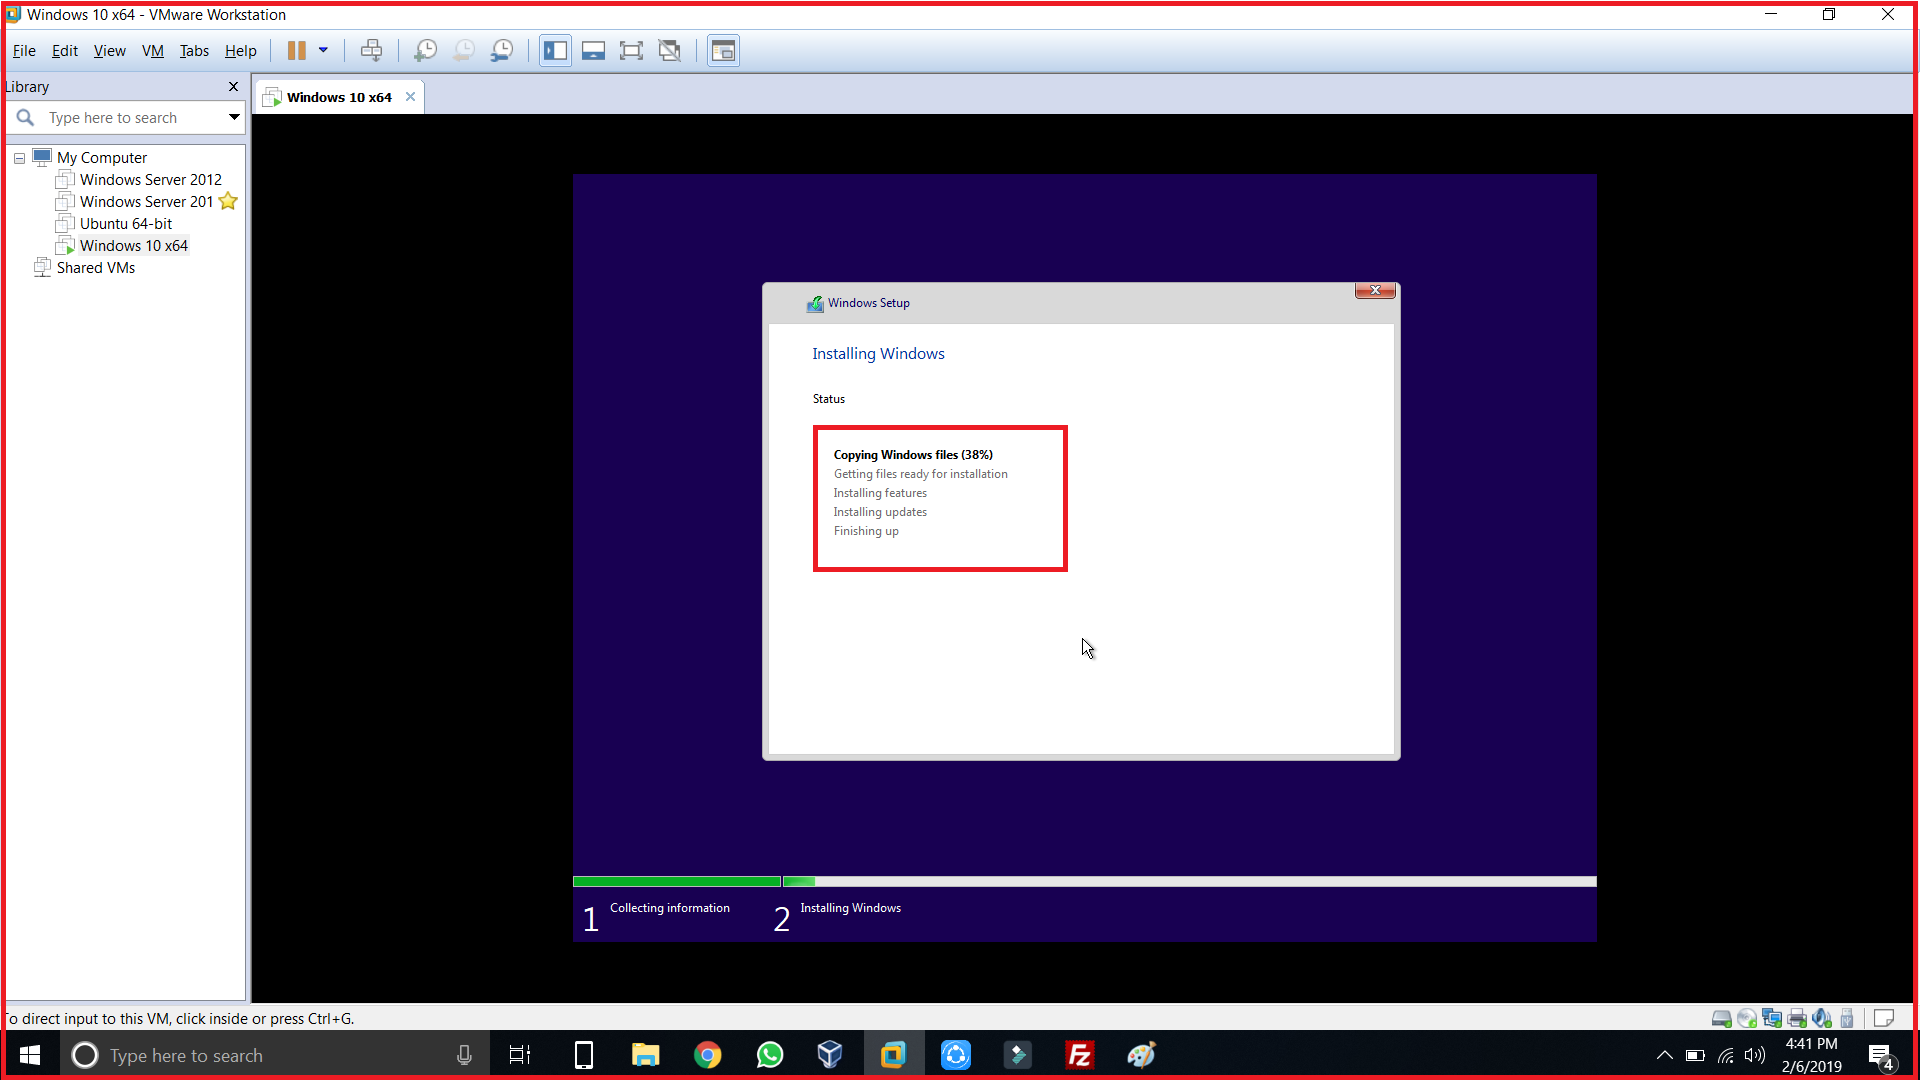 copying windows files